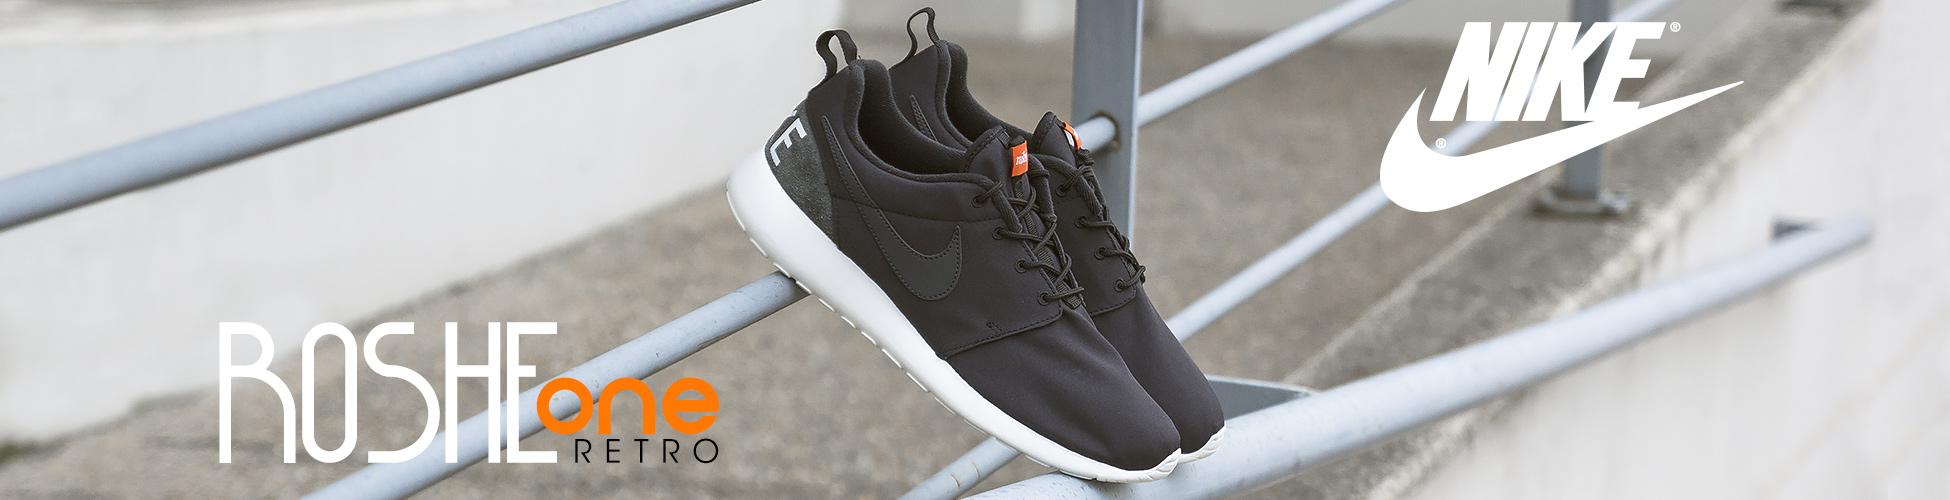 Nike Roshe One Retro Black-Anthracita